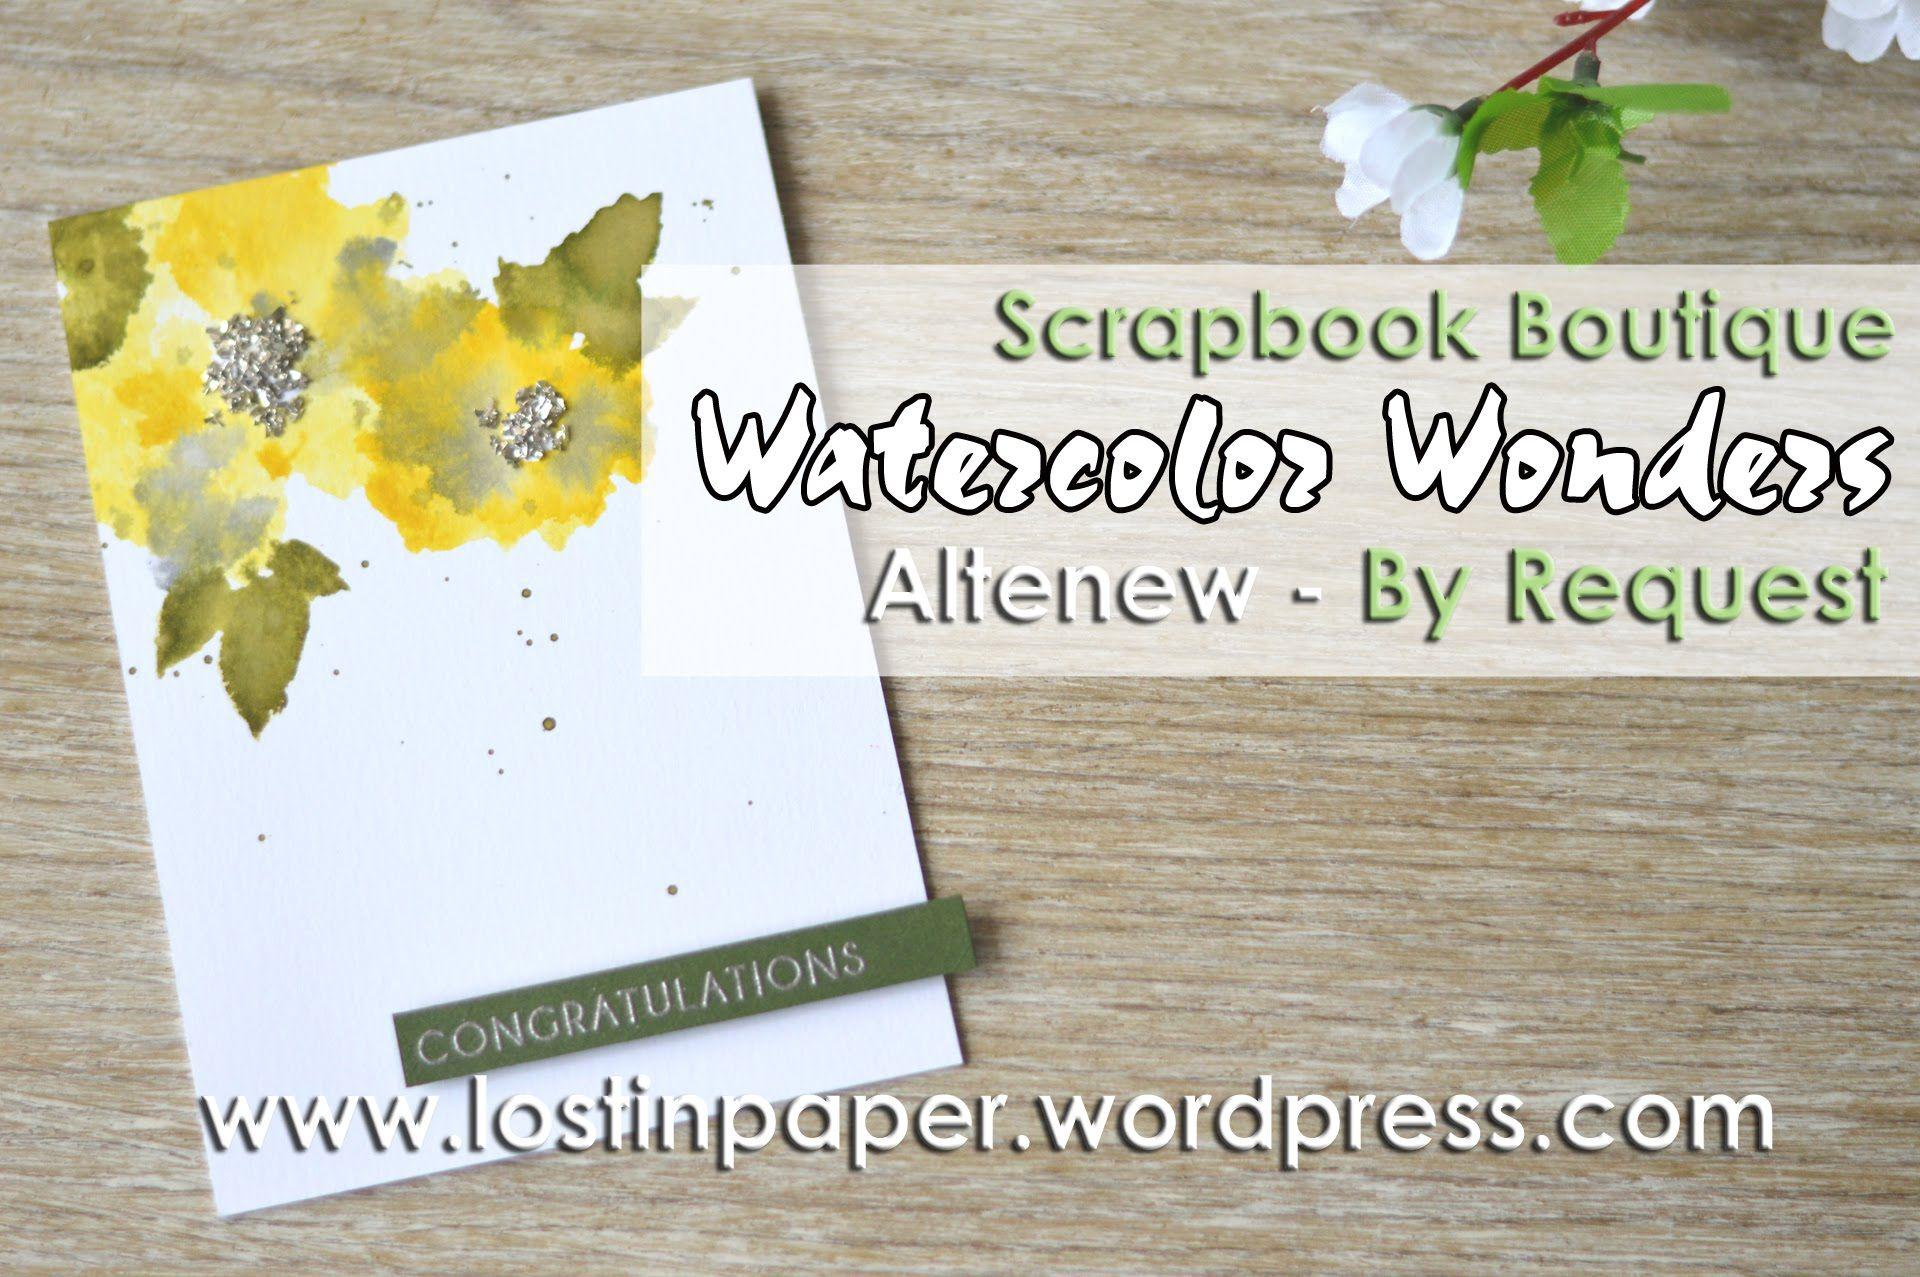 Altenew Watercolor Wonders 'By Request' for Scrapbook Boutique!